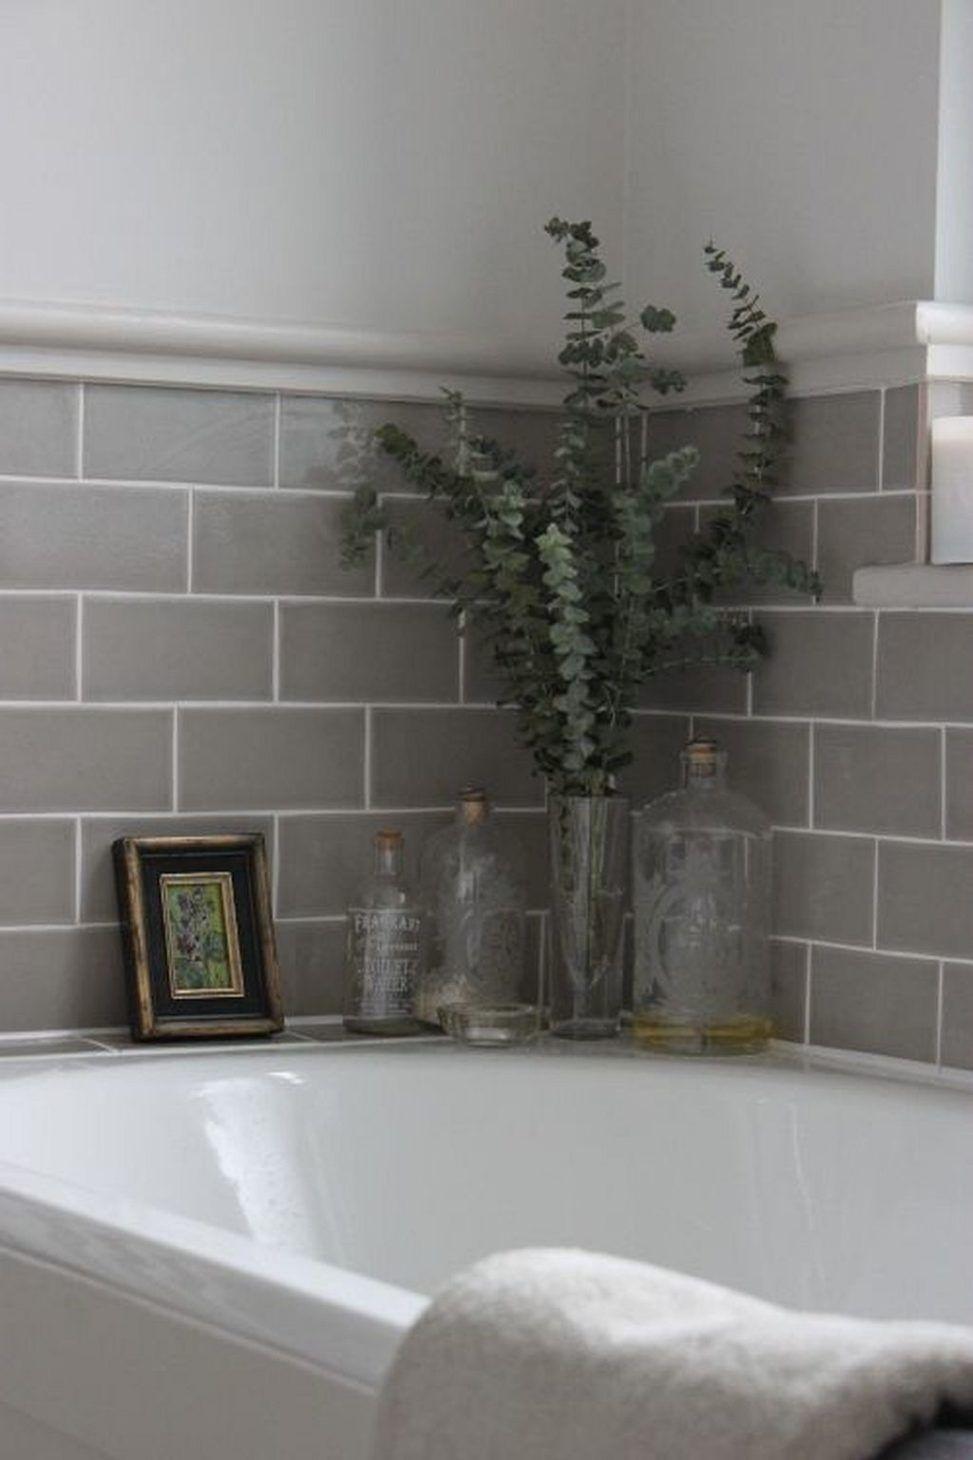 Latest Trends In Bathroom Tile Design 10 Bathroomdiydecor Bathrooms Remodel Bathroom Decor Bathroom Design